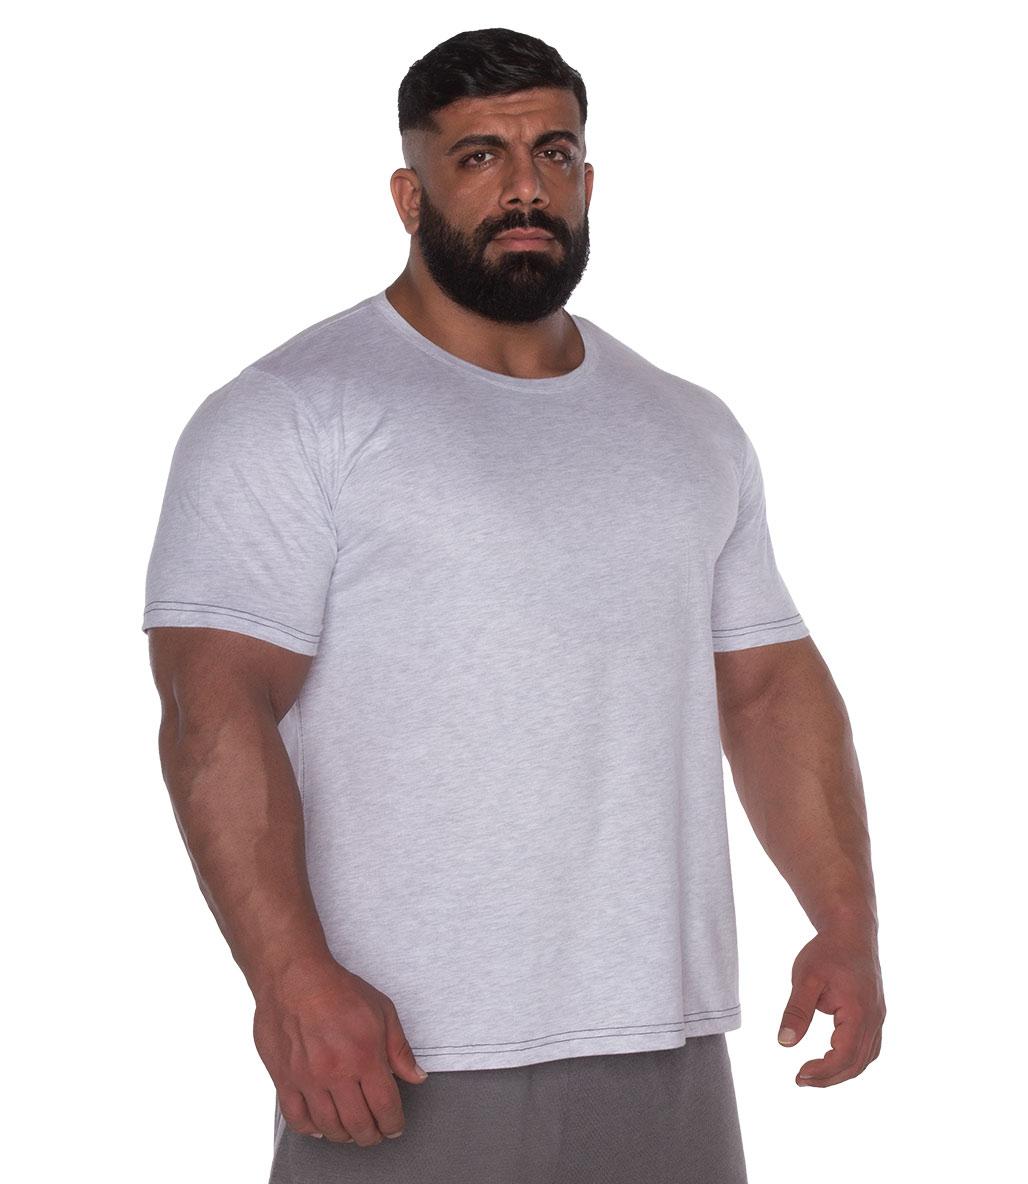 Kingsize Sbd Antrenman T-Shirt Açık Gri Melanj